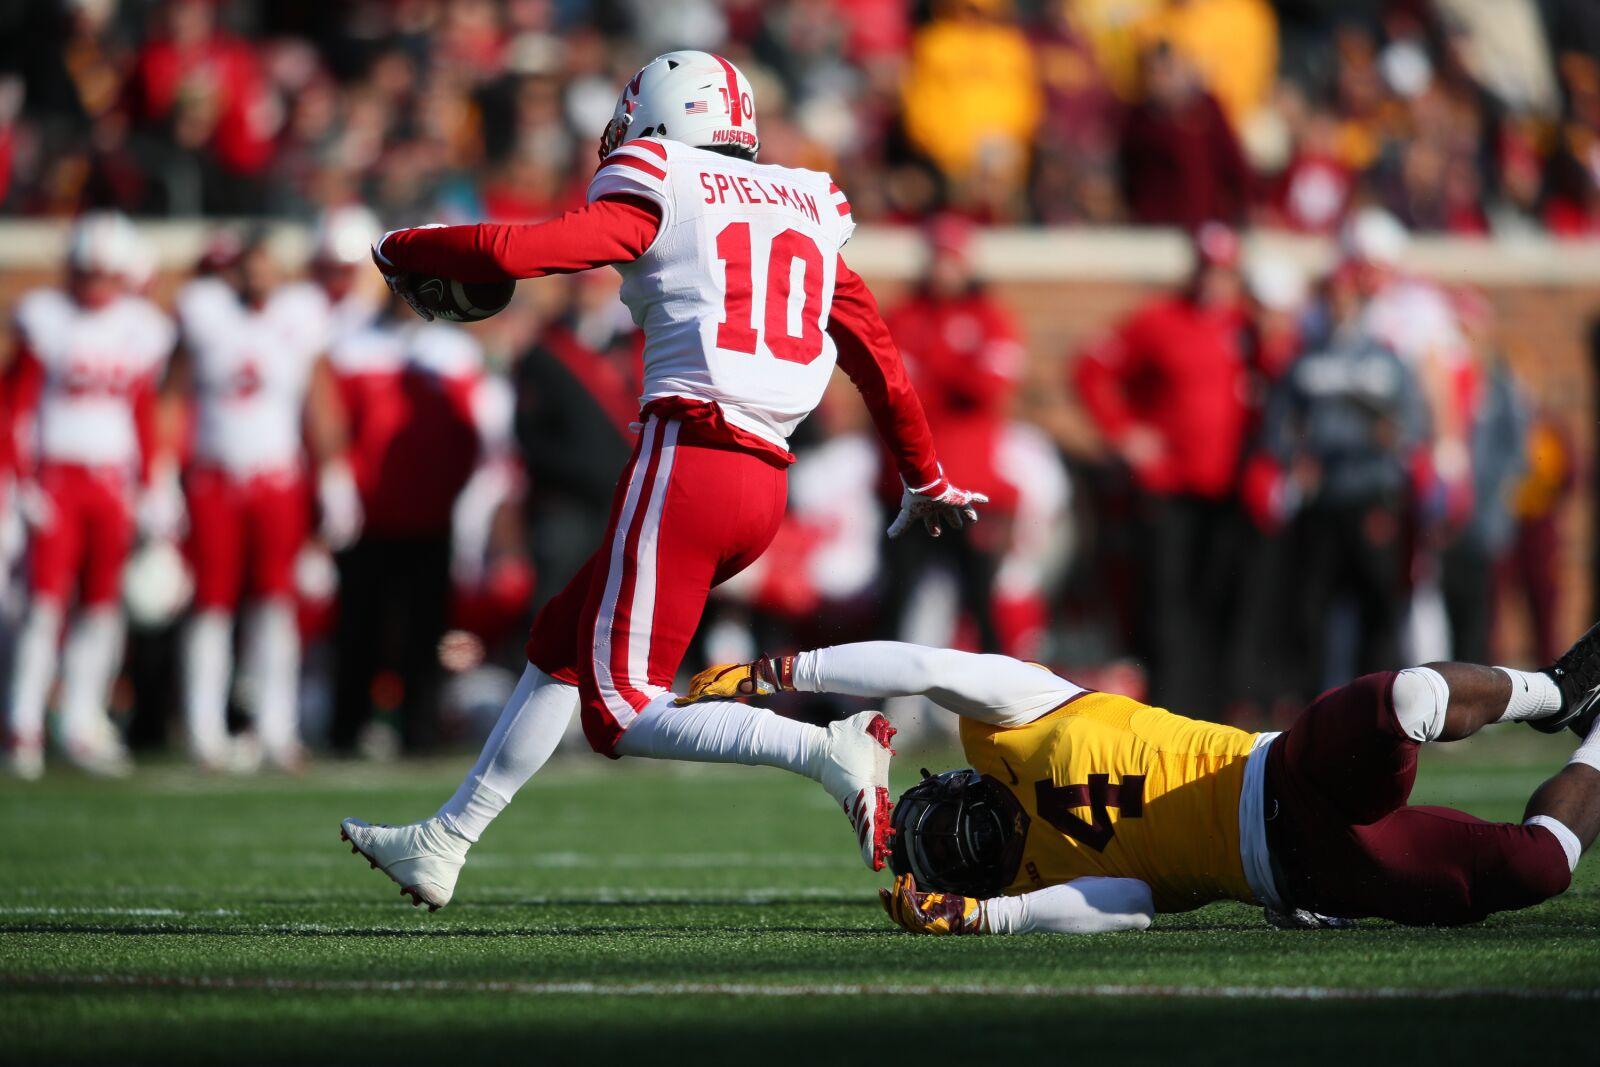 Nebraska football tailgate Week 8: Huskers go Gopher hunting